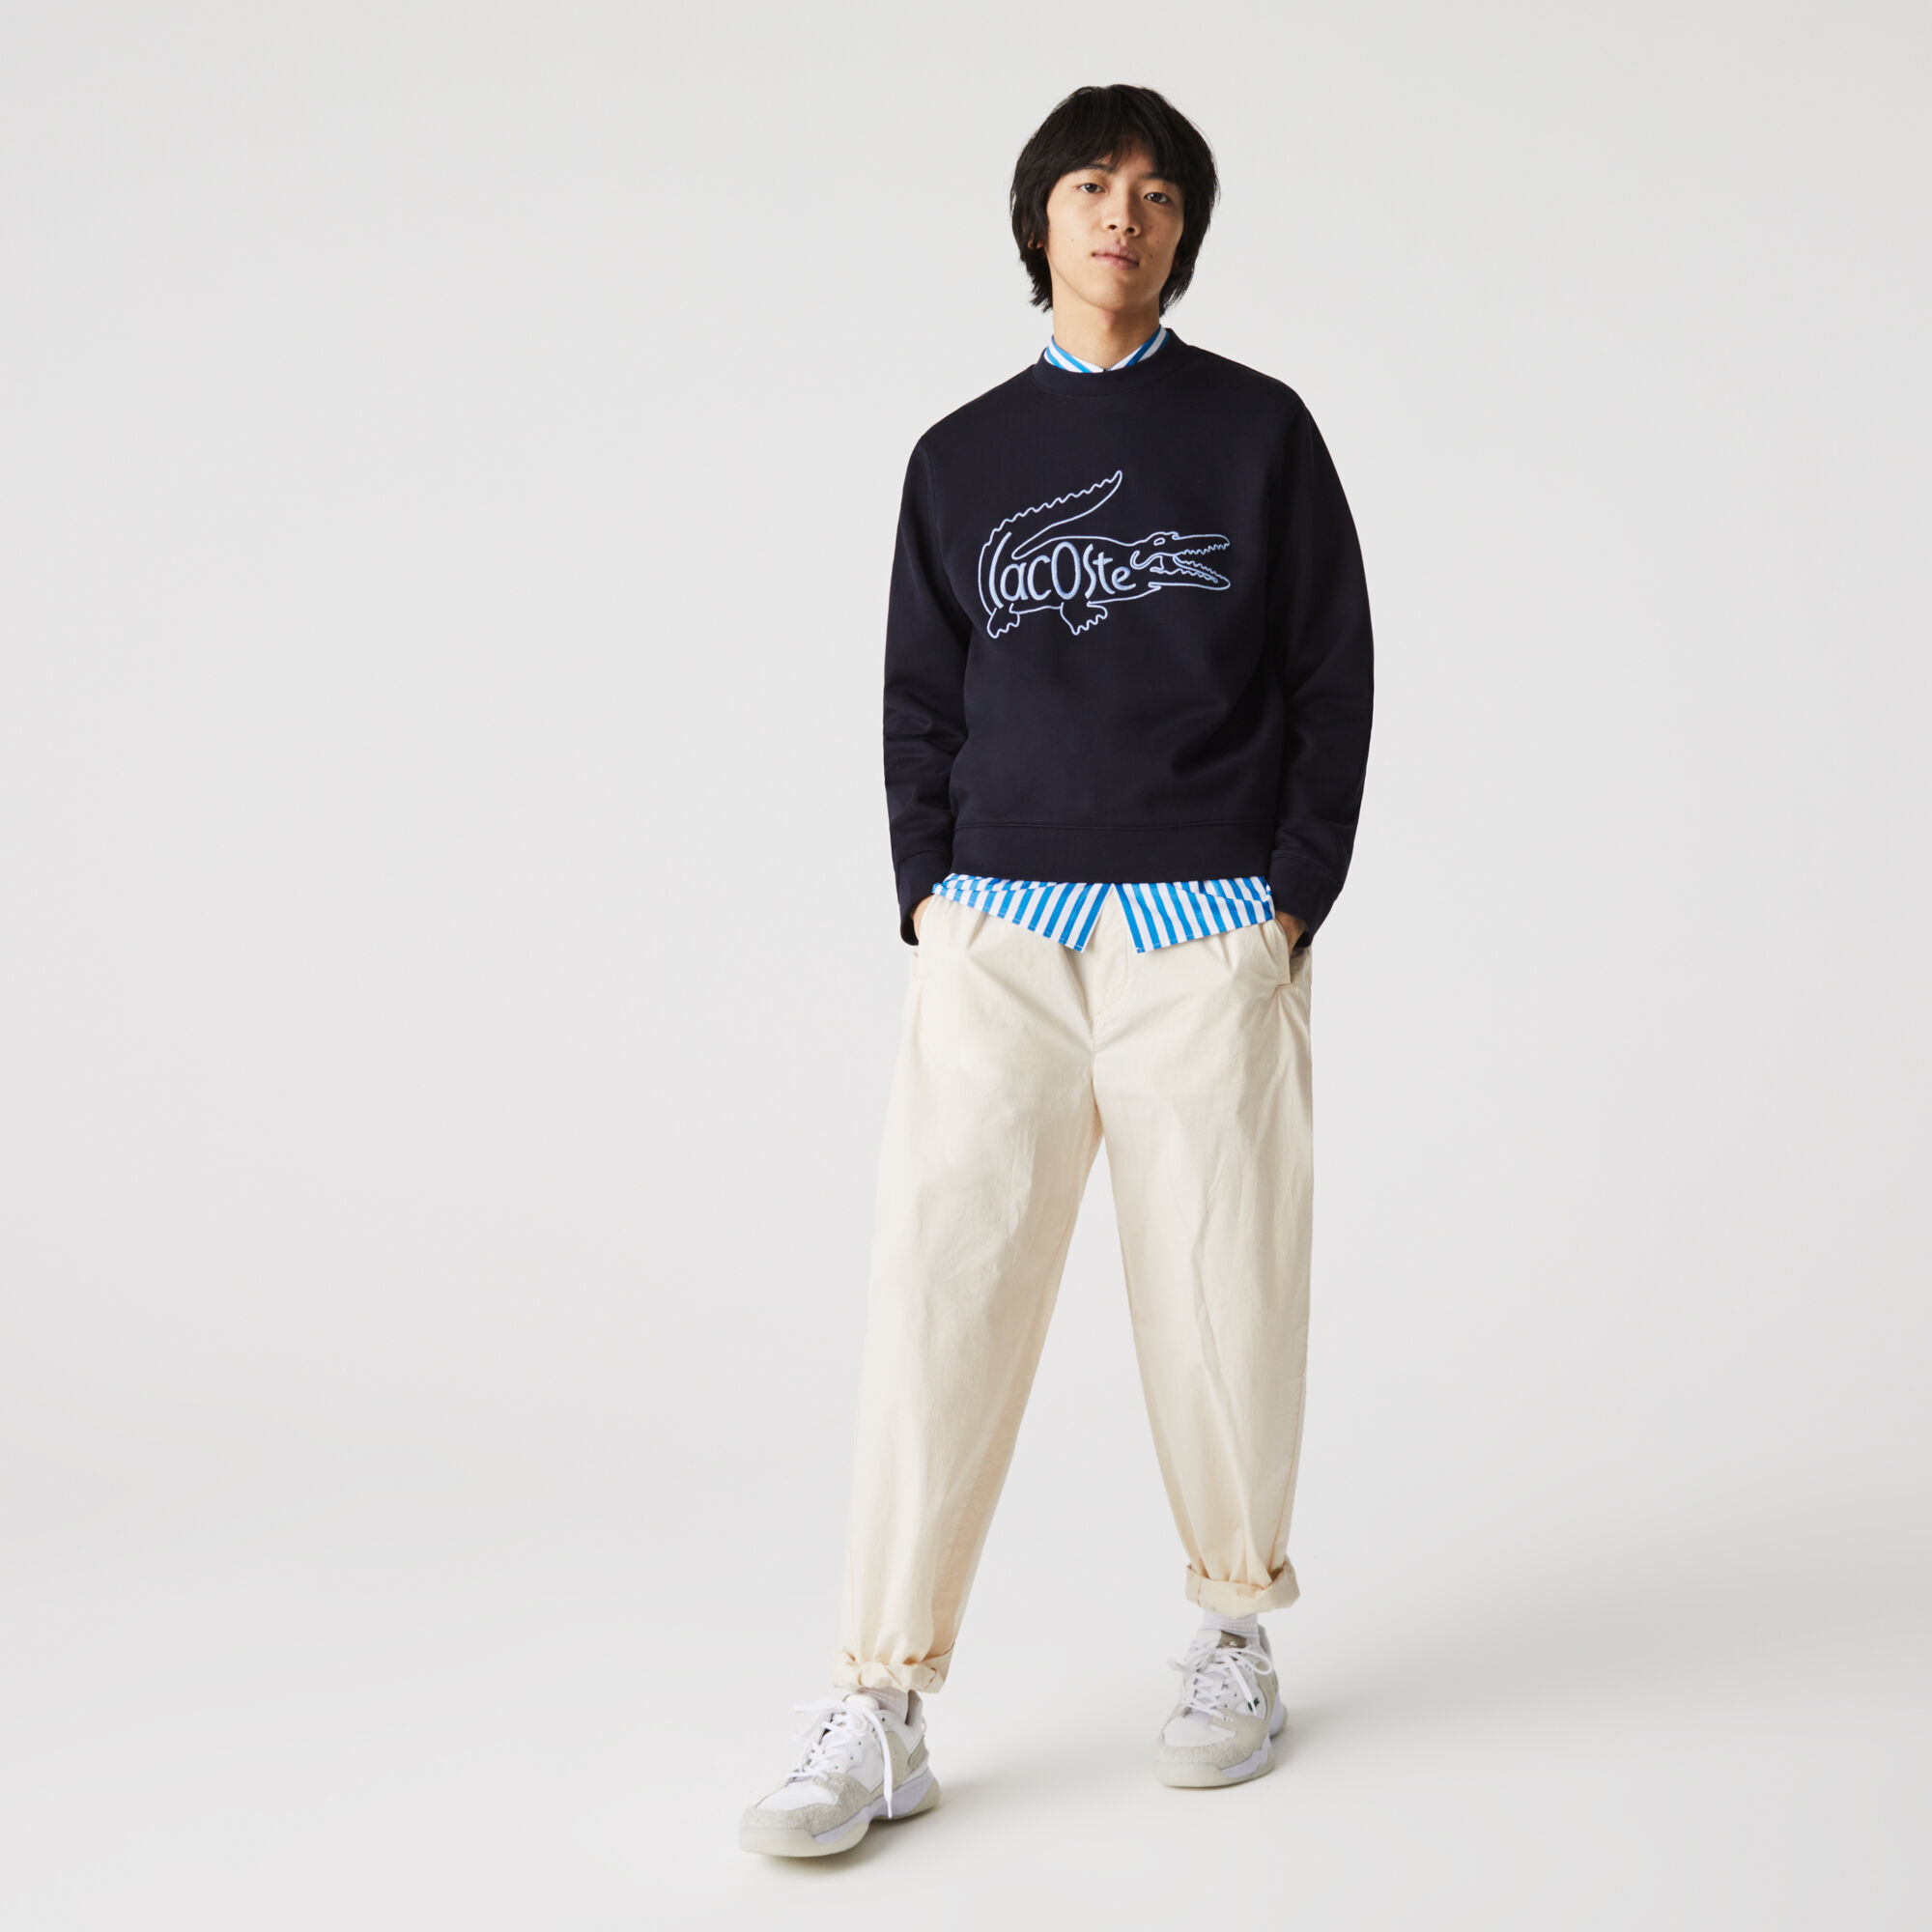 Men's Crew Neck Embroidered Crocodile Cotton Fleece Sweatshirt